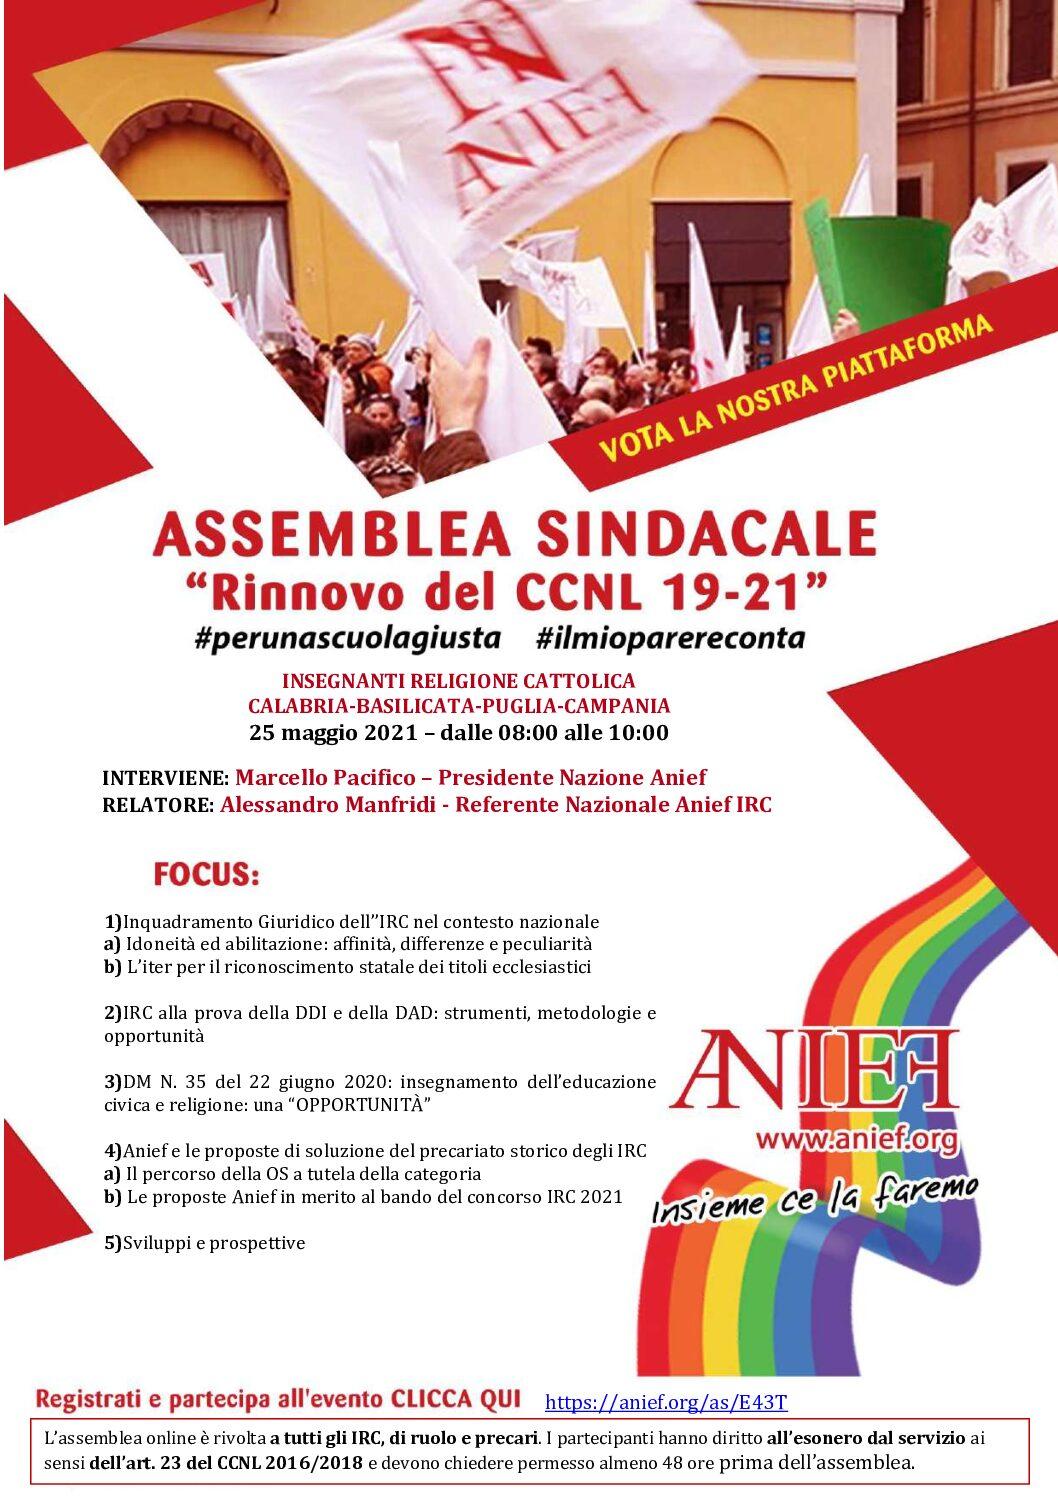 Assemblea Sindacale Territoriale Anief dei docenti di religione cattolica